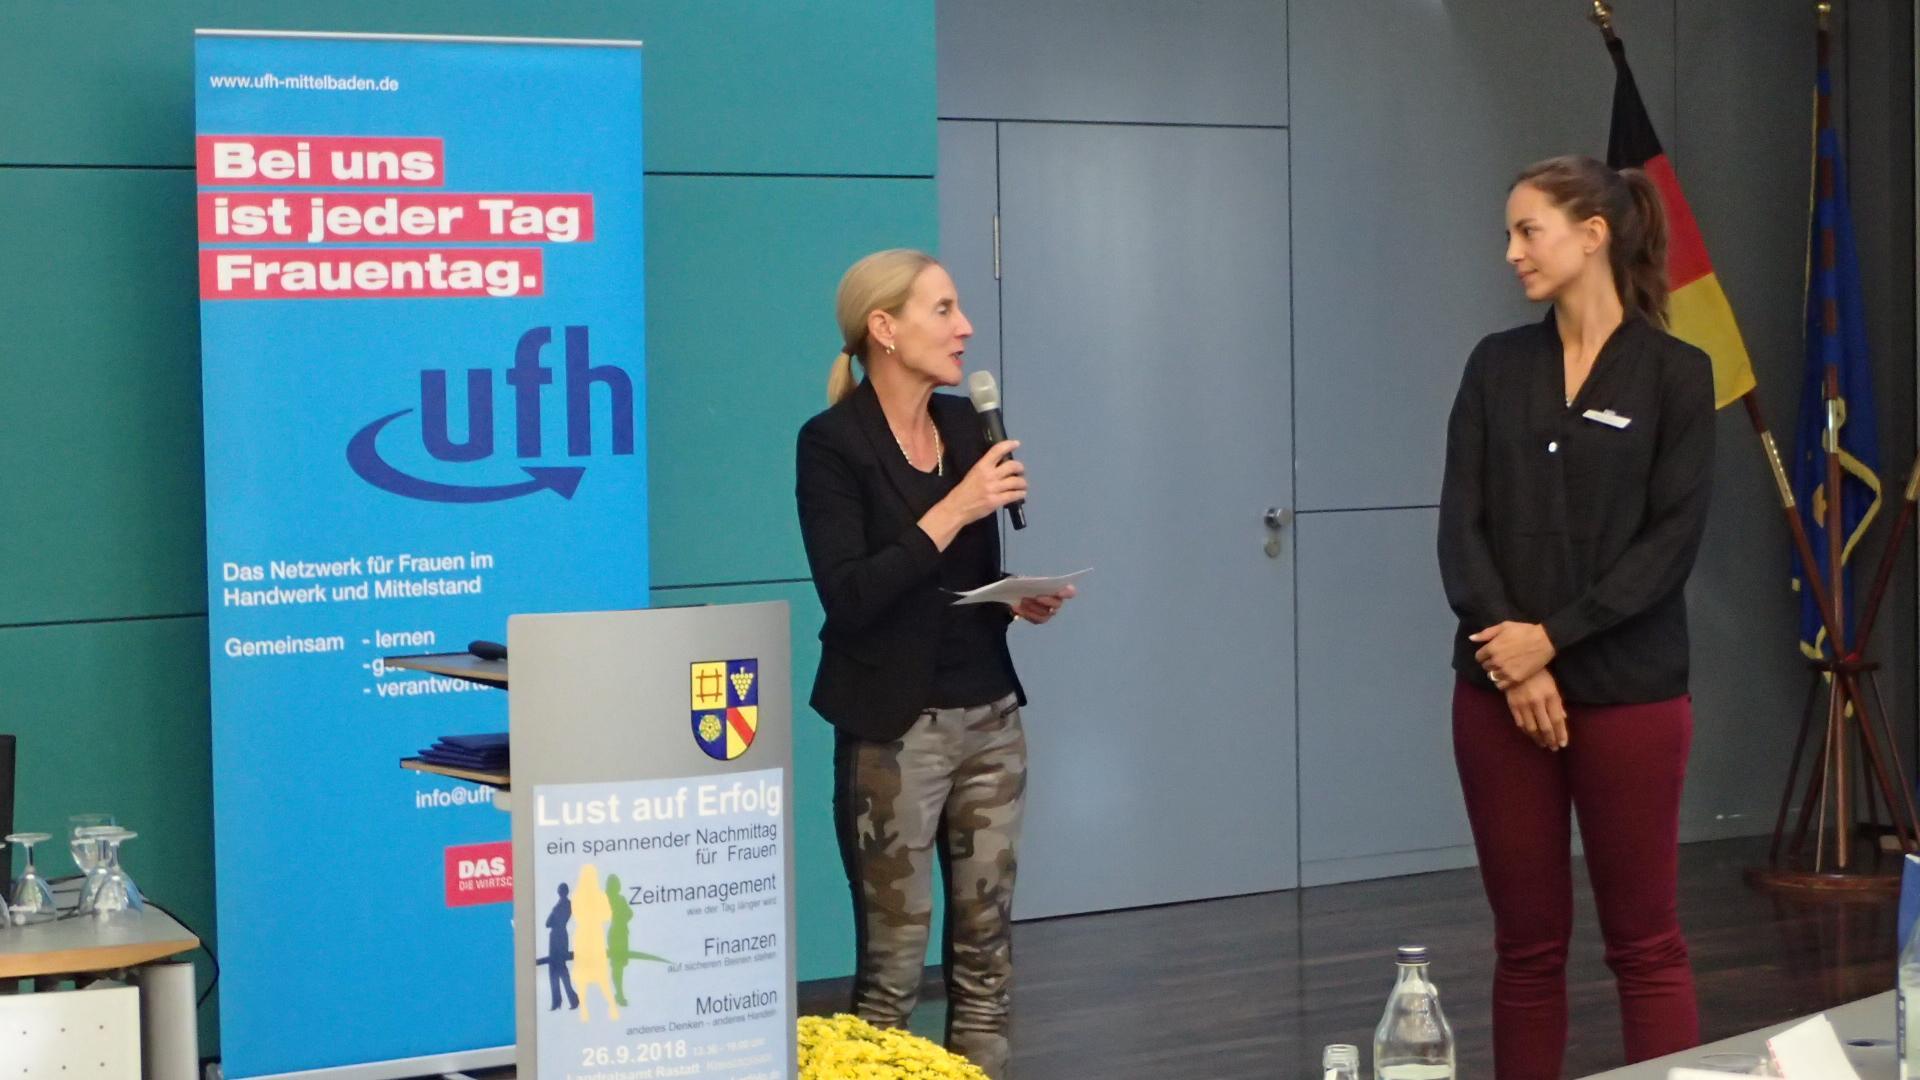 09-18 Silvia Bajon, re, Volksbank Baden-Baden, Rastatt